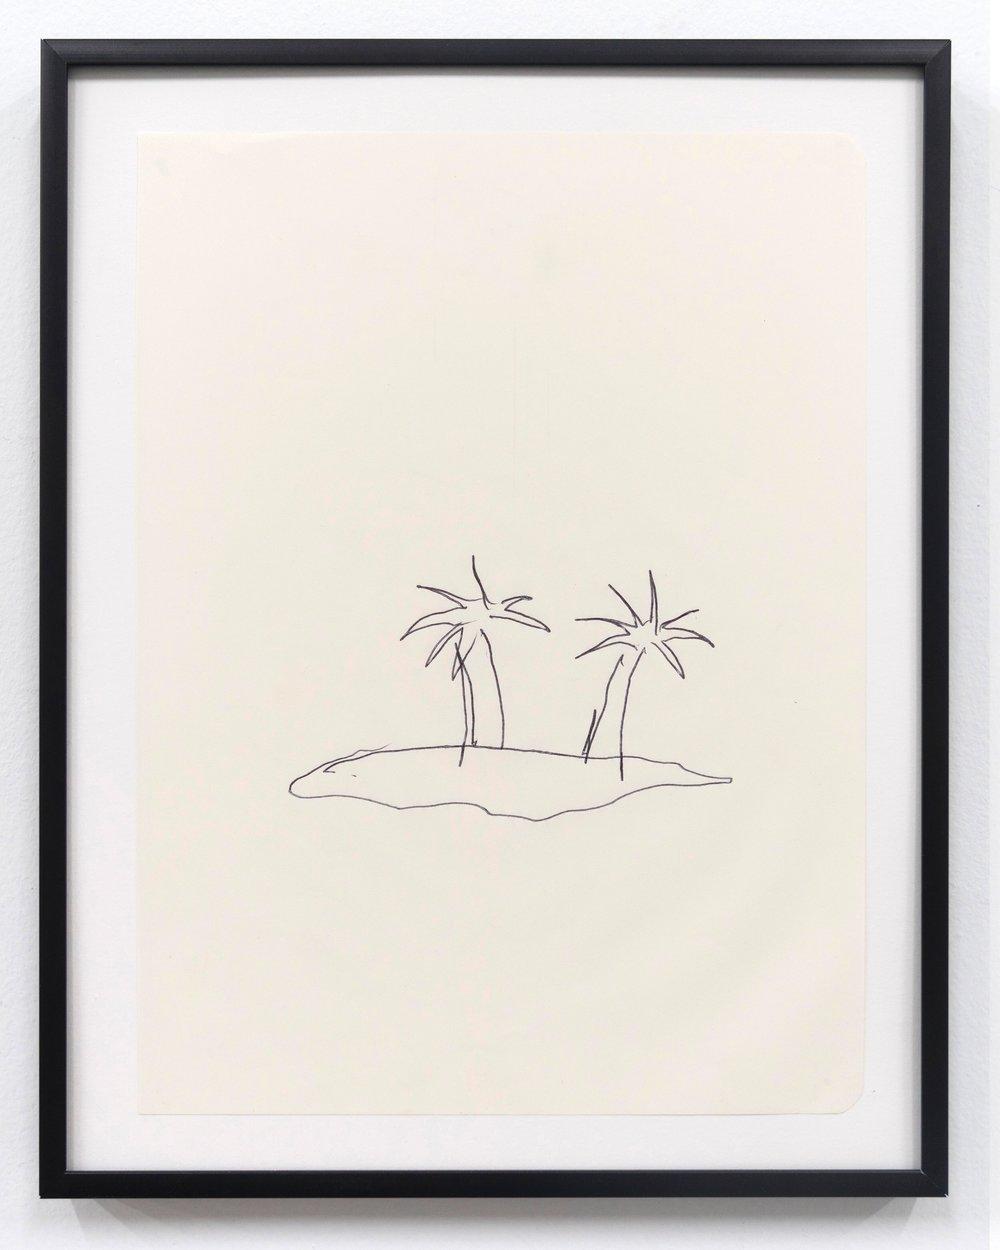 Emilie Gossiaux    The Beach , 2018 Ink on newsprint   11 1/2 x 9 1/8 inches 29.2 x 23.2 cm